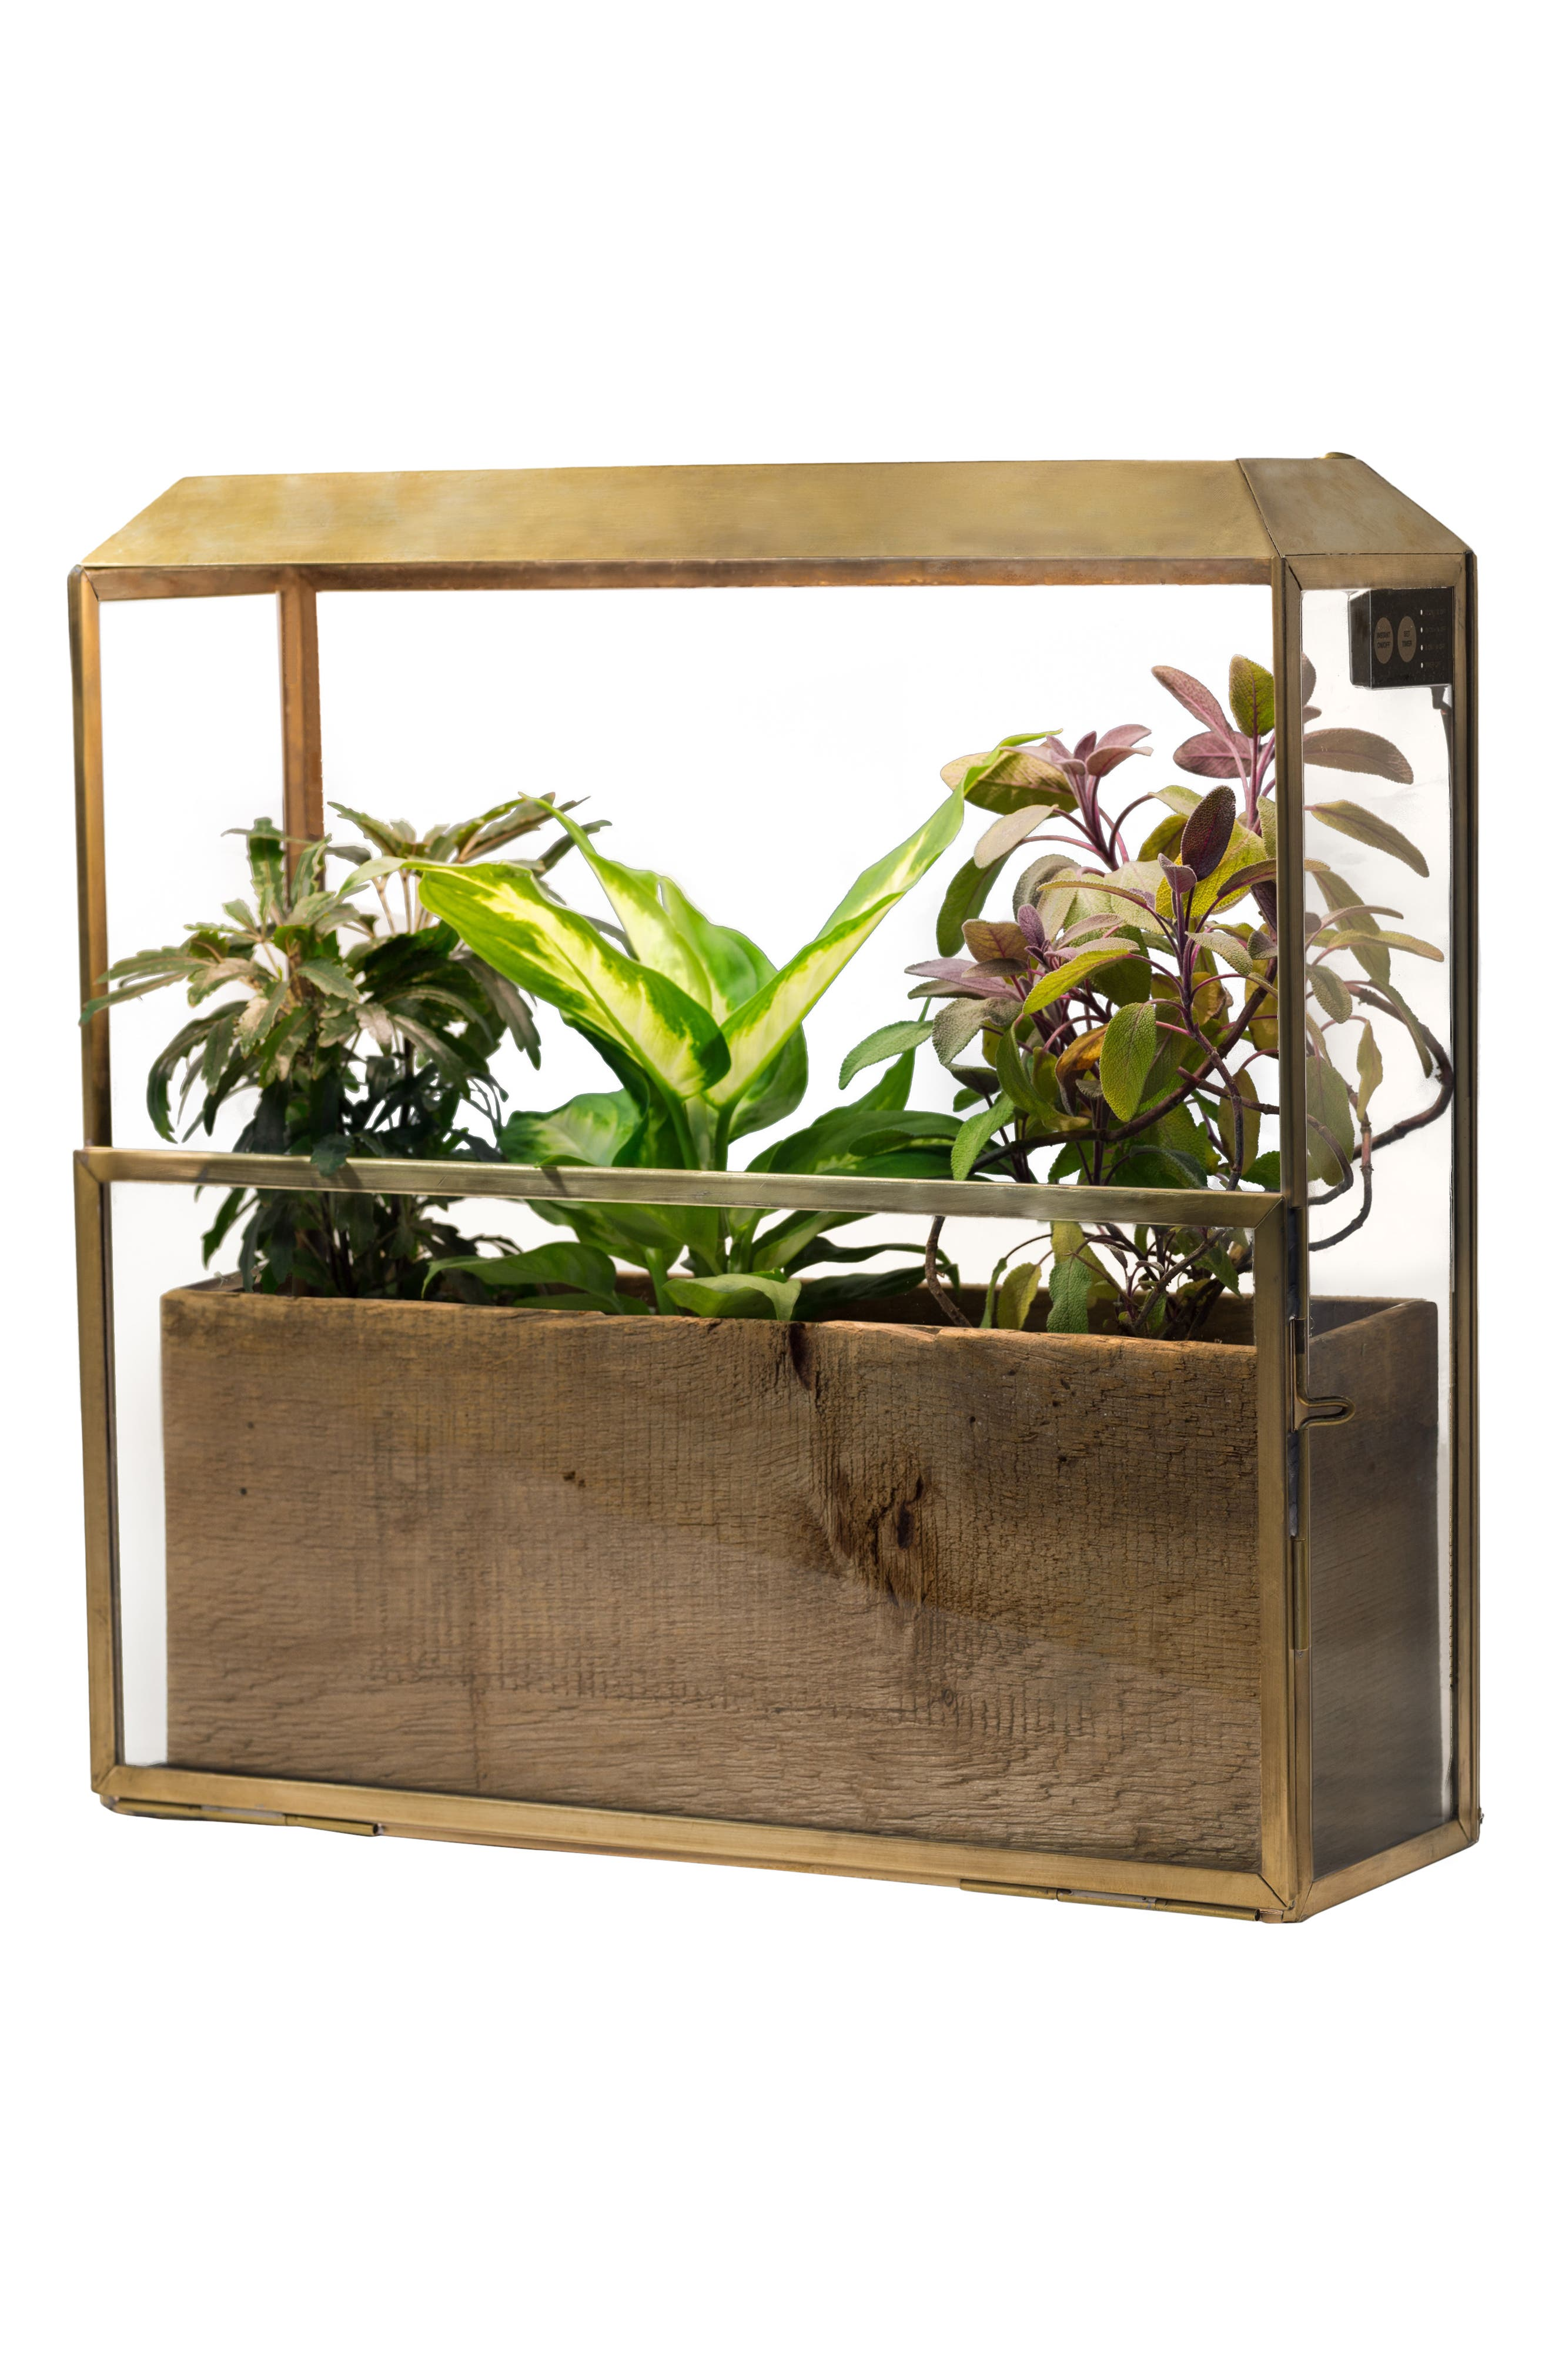 Growhouse Greenhouse & Growlight,                             Alternate thumbnail 5, color,                             Brass N Glass